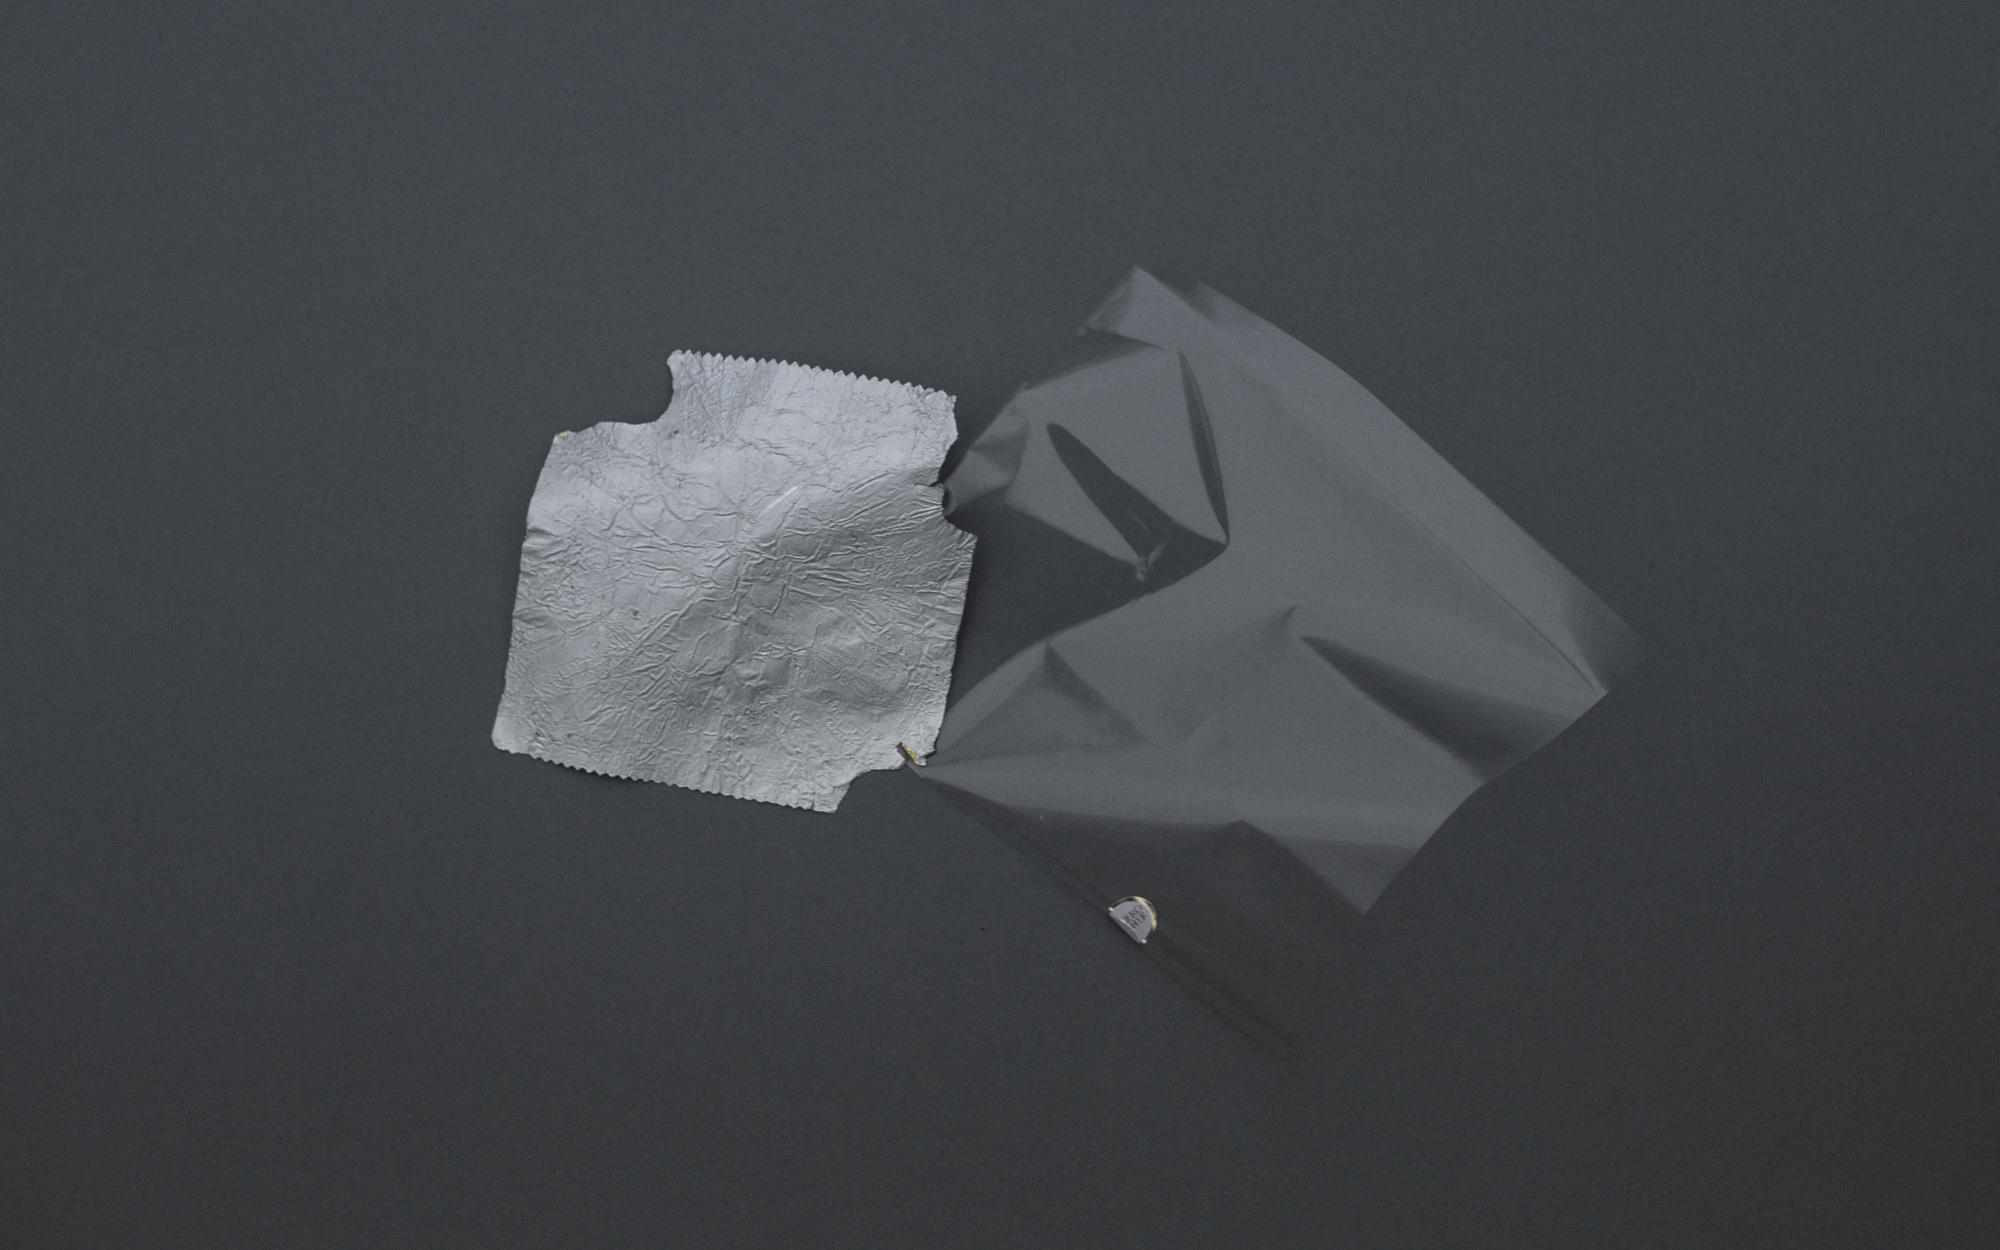 Unwrapped-24.jpg